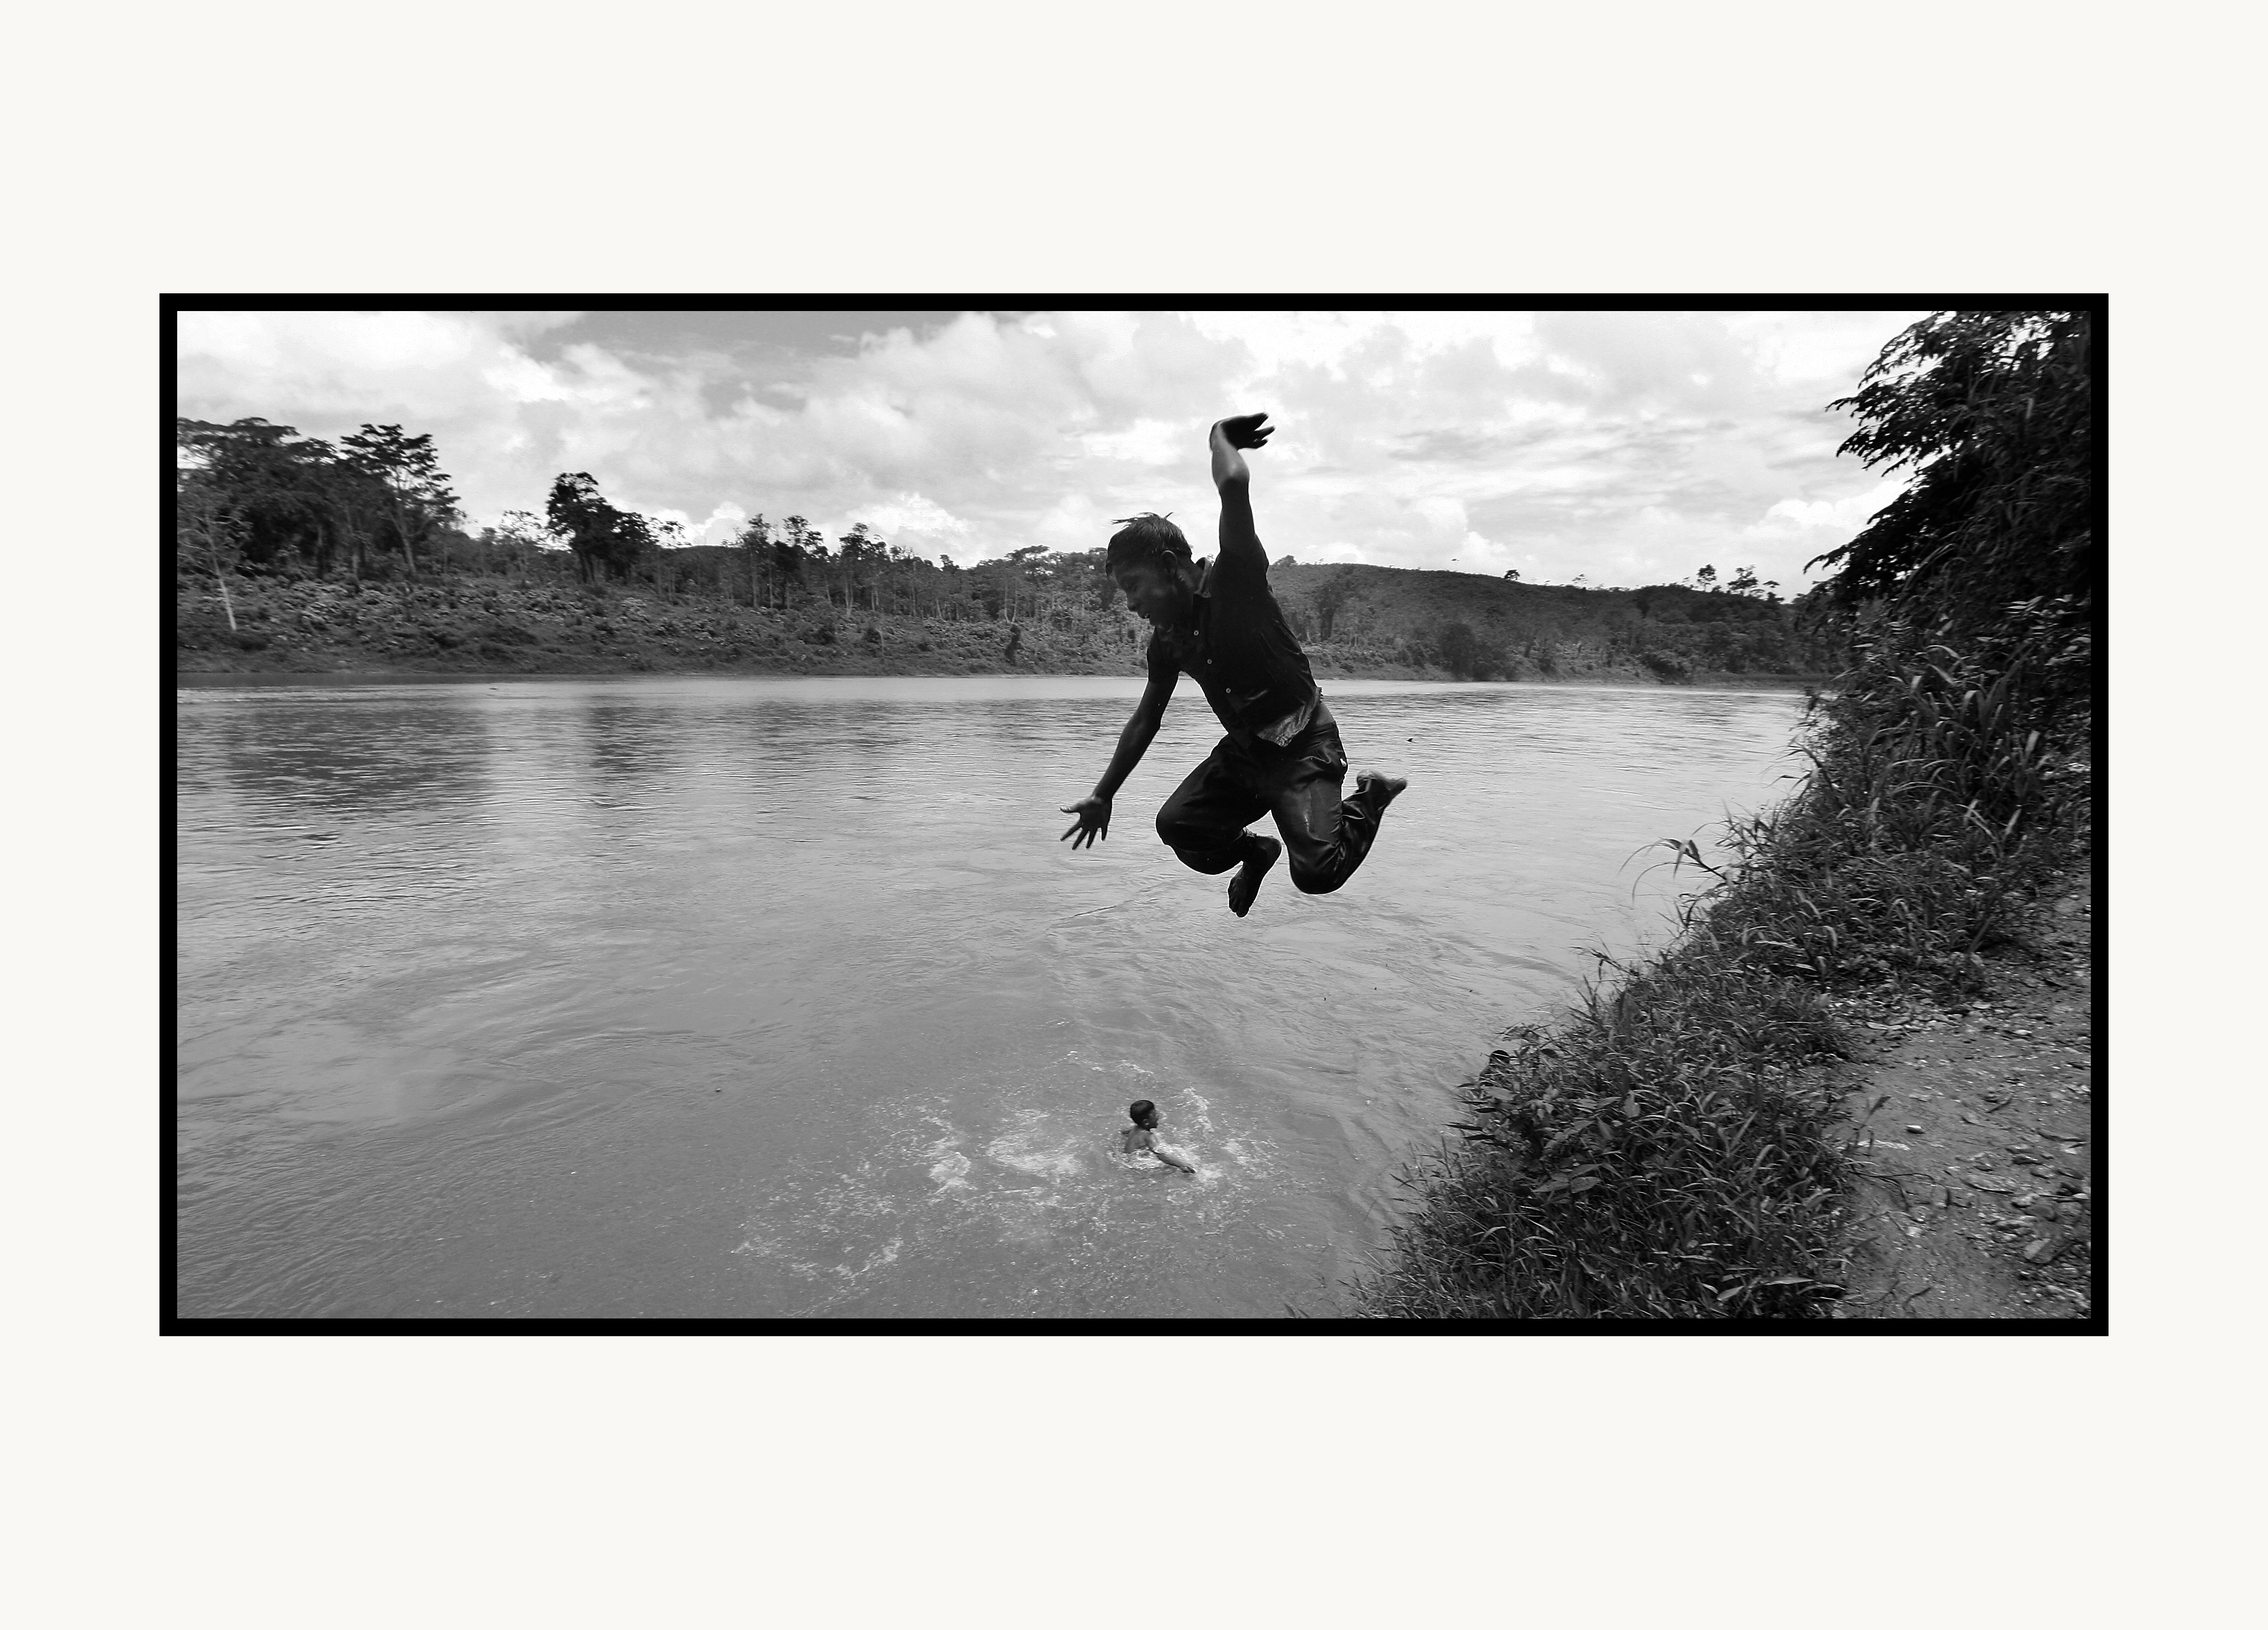 nicaragua river jump IMG_2380 copy poster